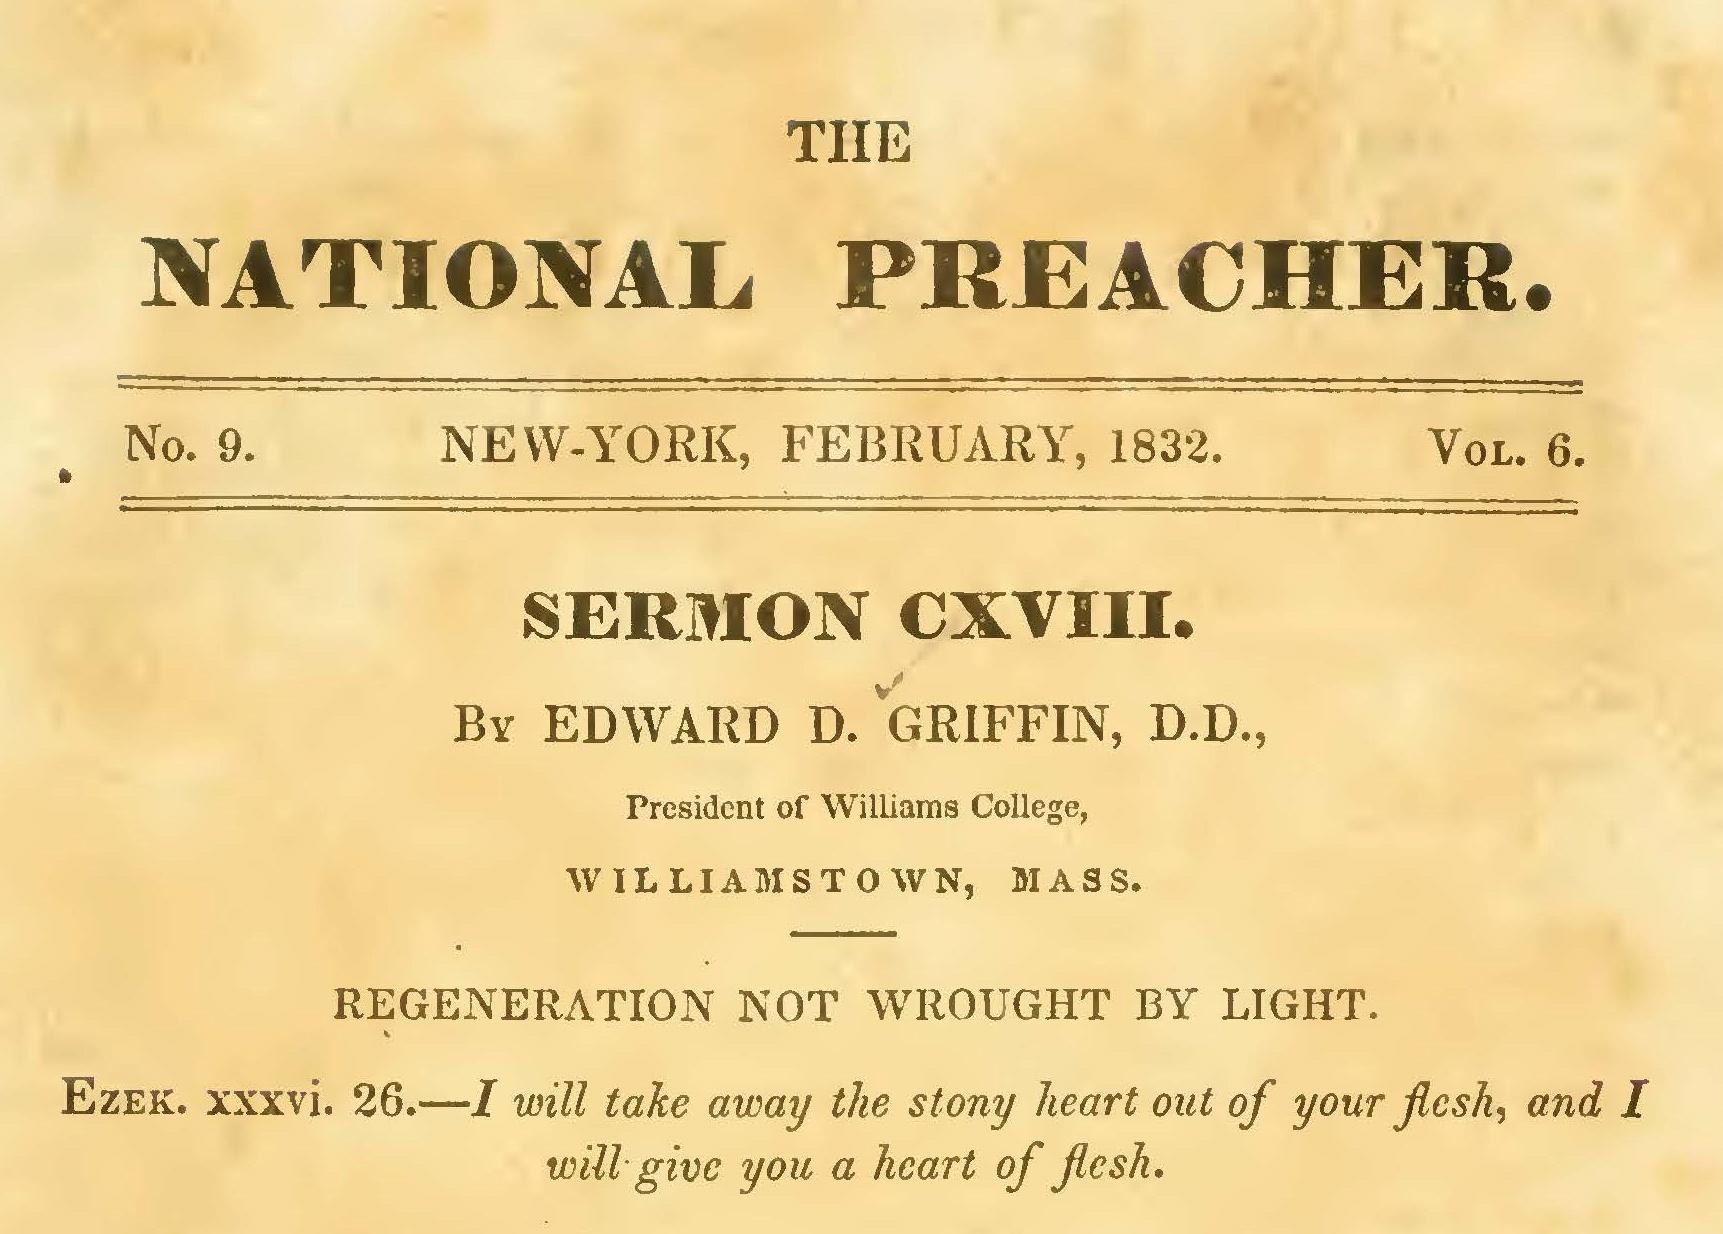 Griffin, Edward Dorr, Regeneration Not Wrought by Light Title Page.jpg